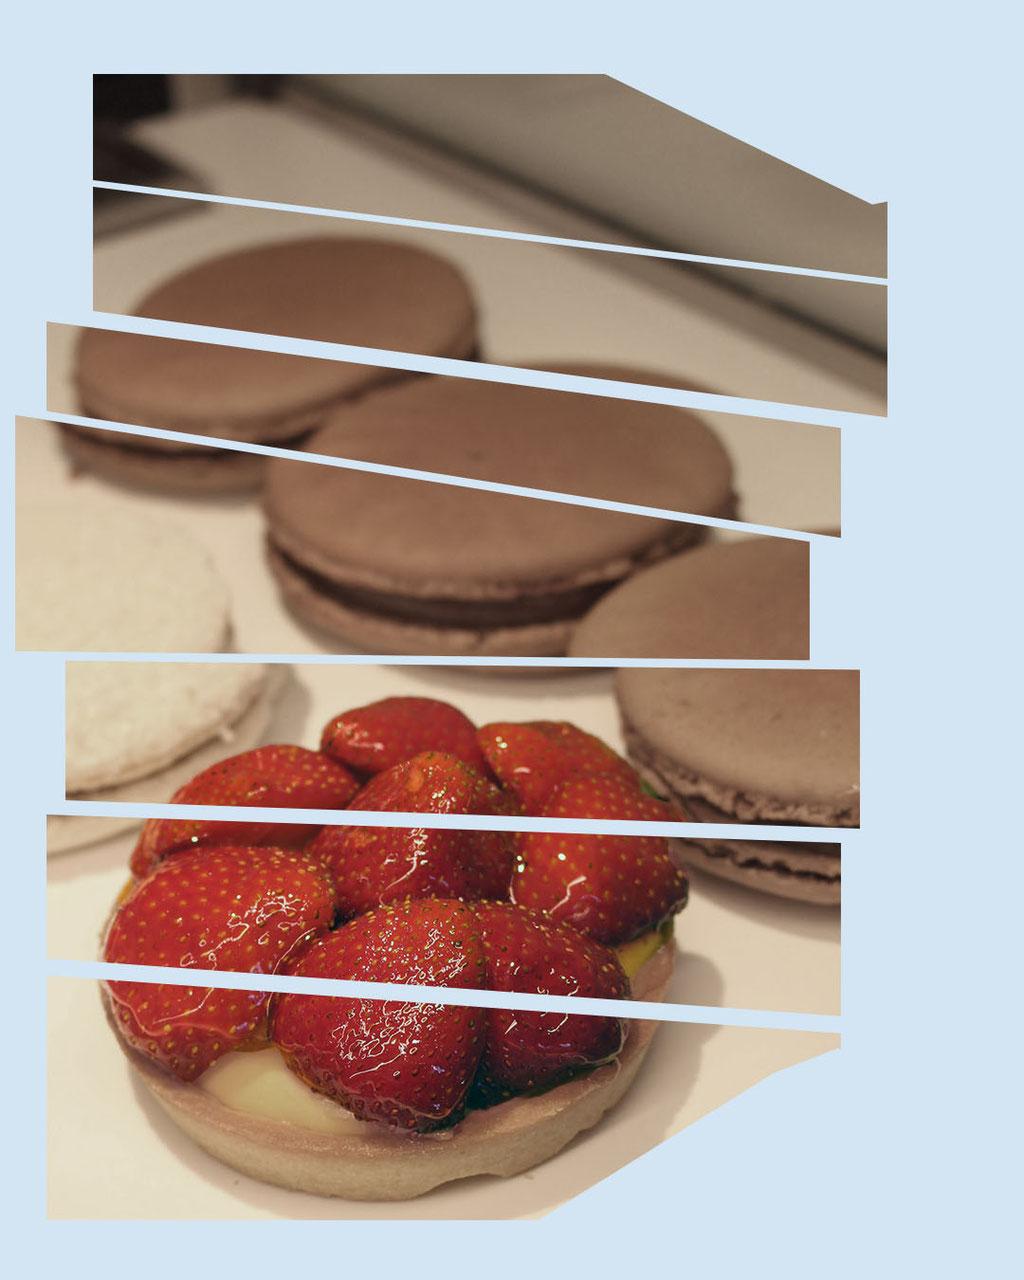 Sjokolademacaron og jordbærterte